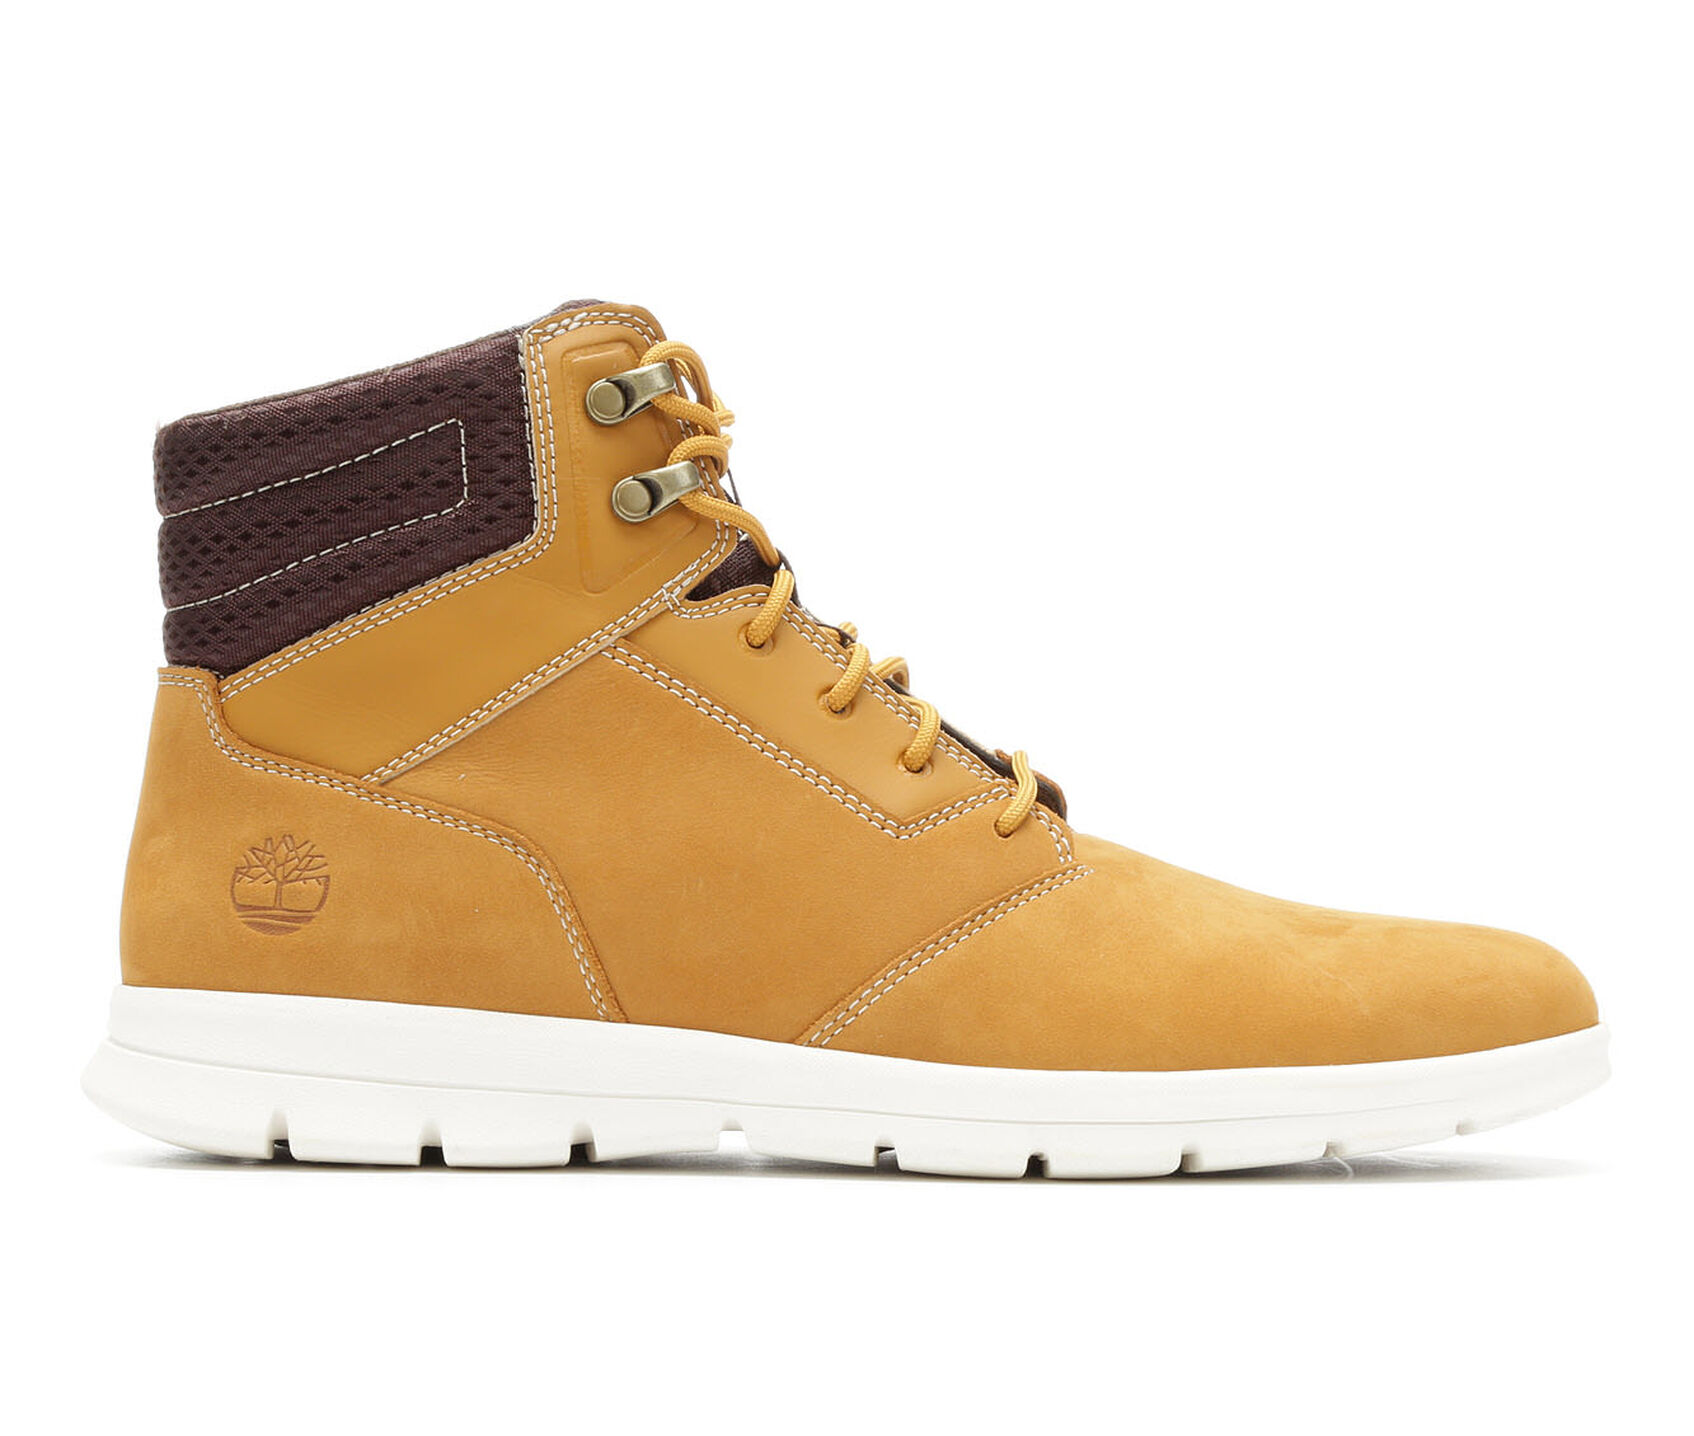 71ac32553 Men's Timberland Graydon Sneaker Boots | Shoe Carnival